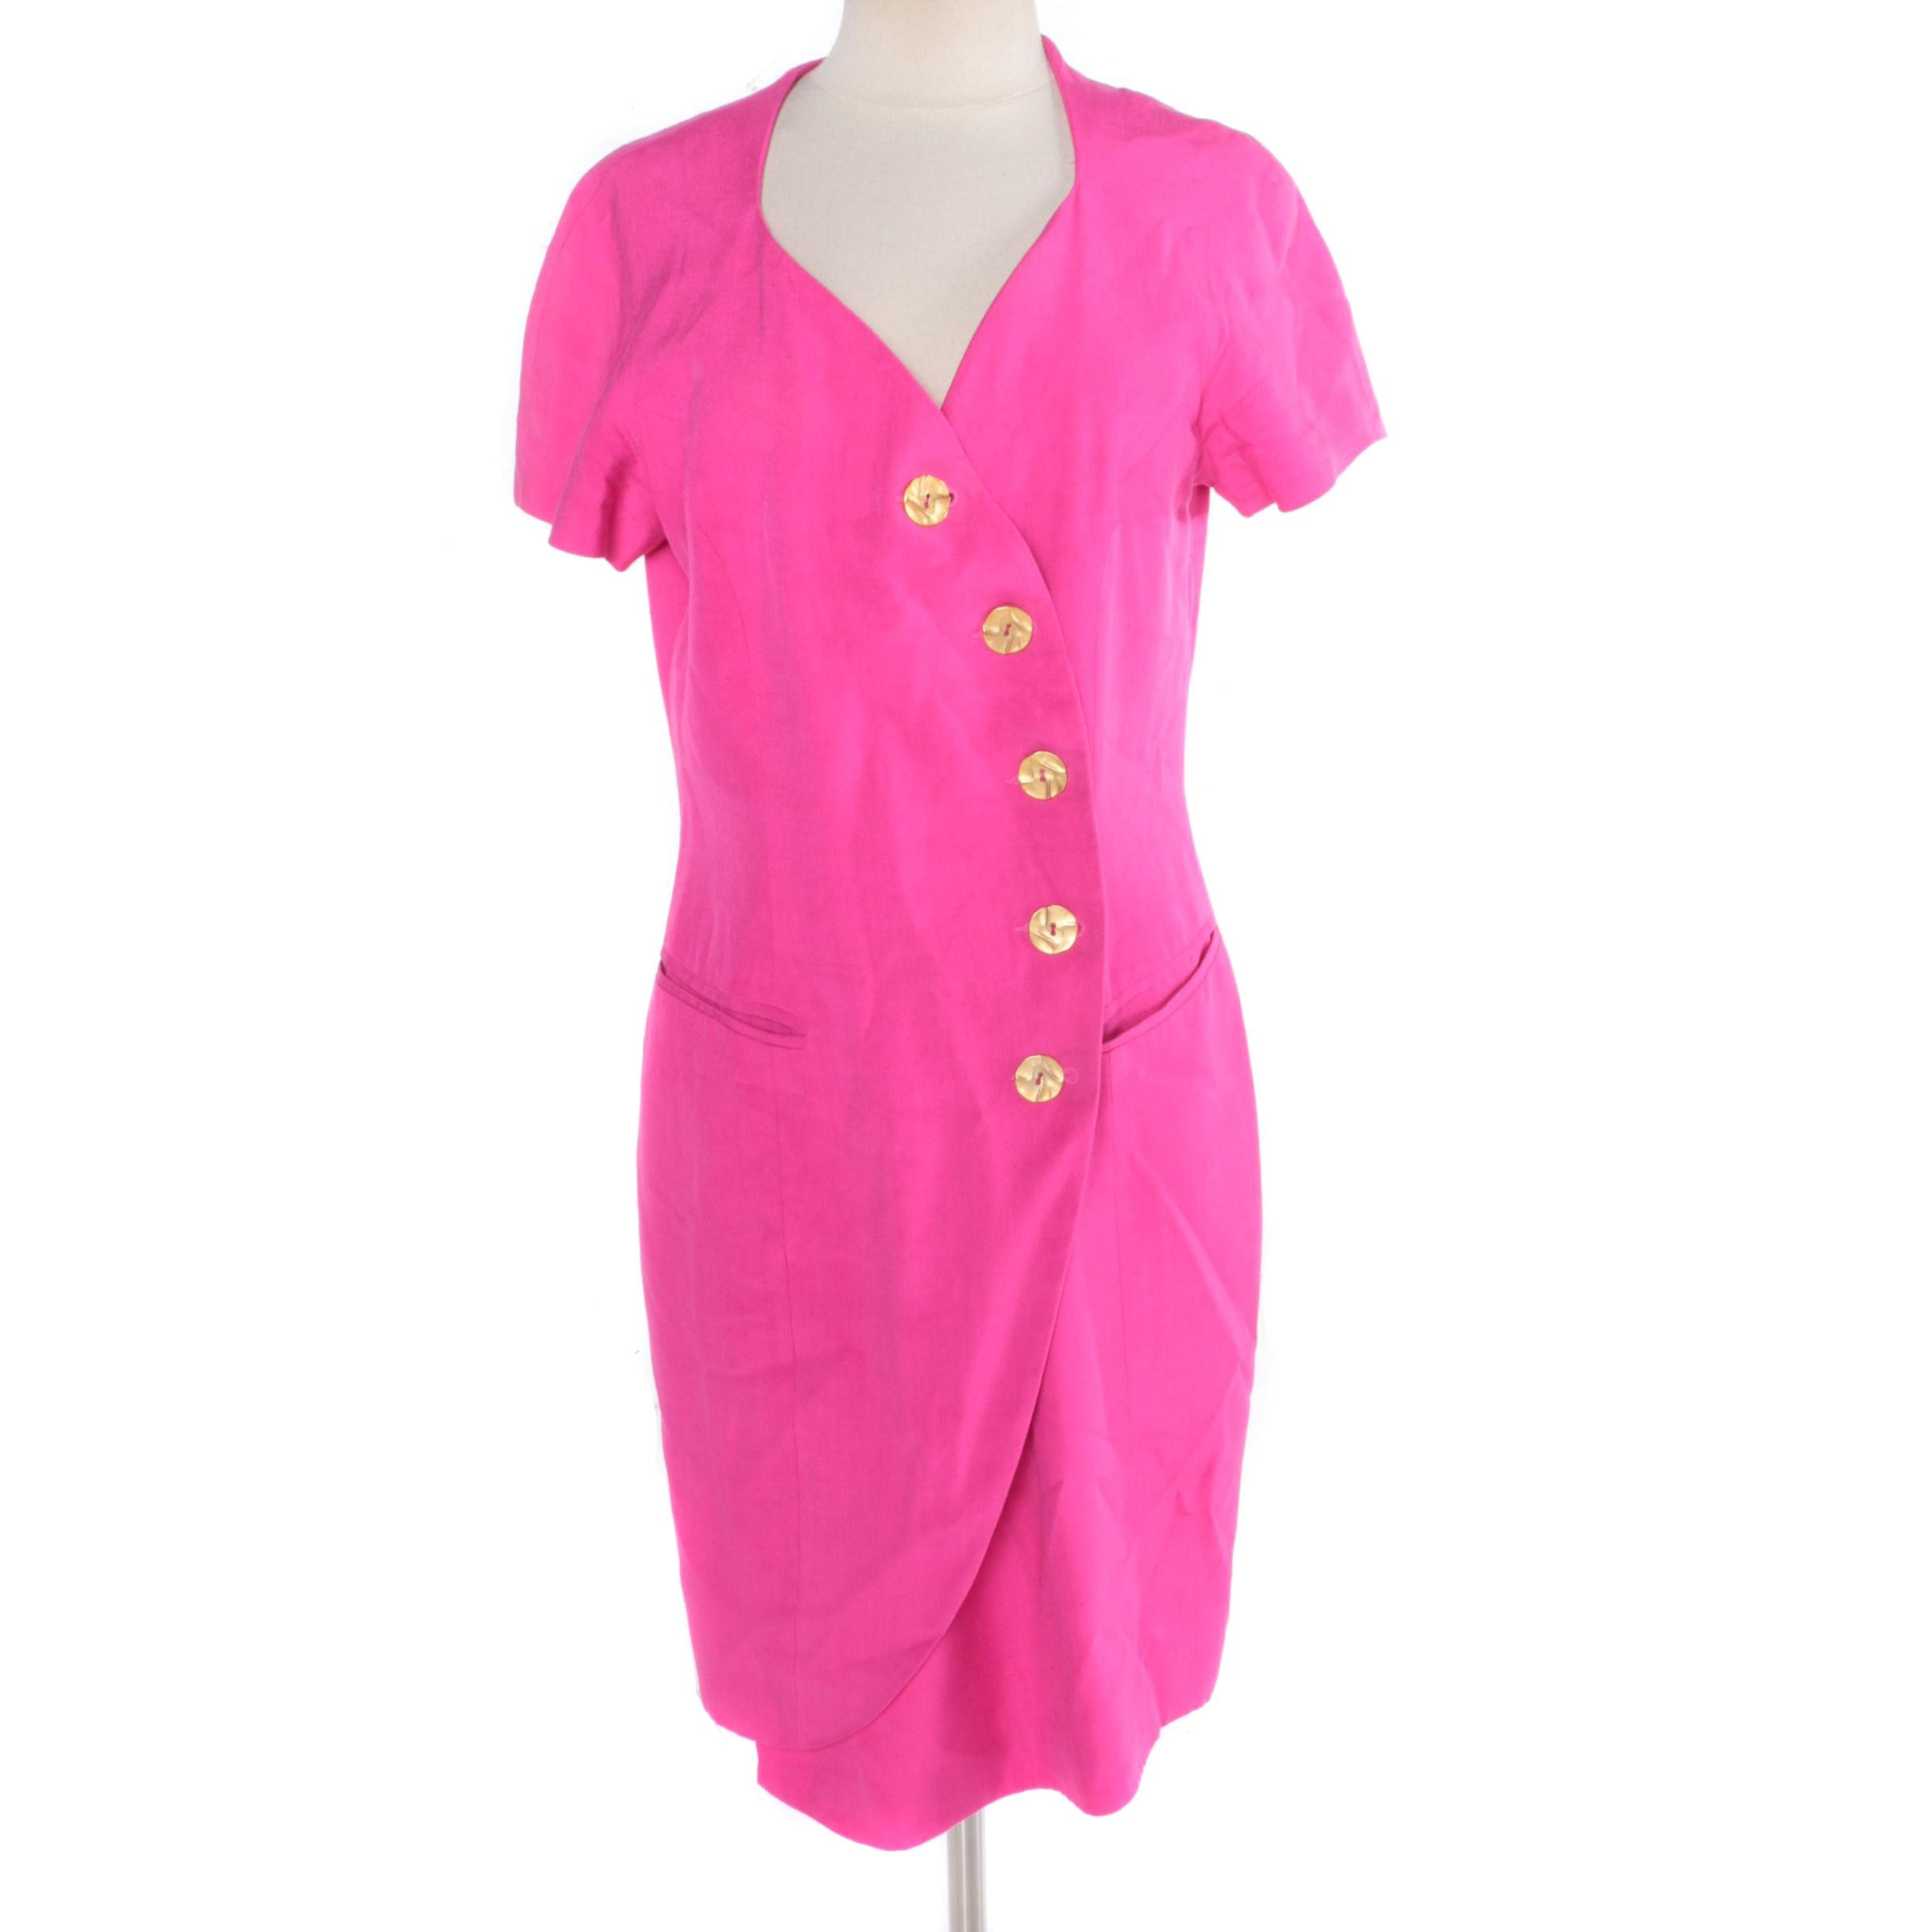 Vintage Tahari Hot Pink Dress